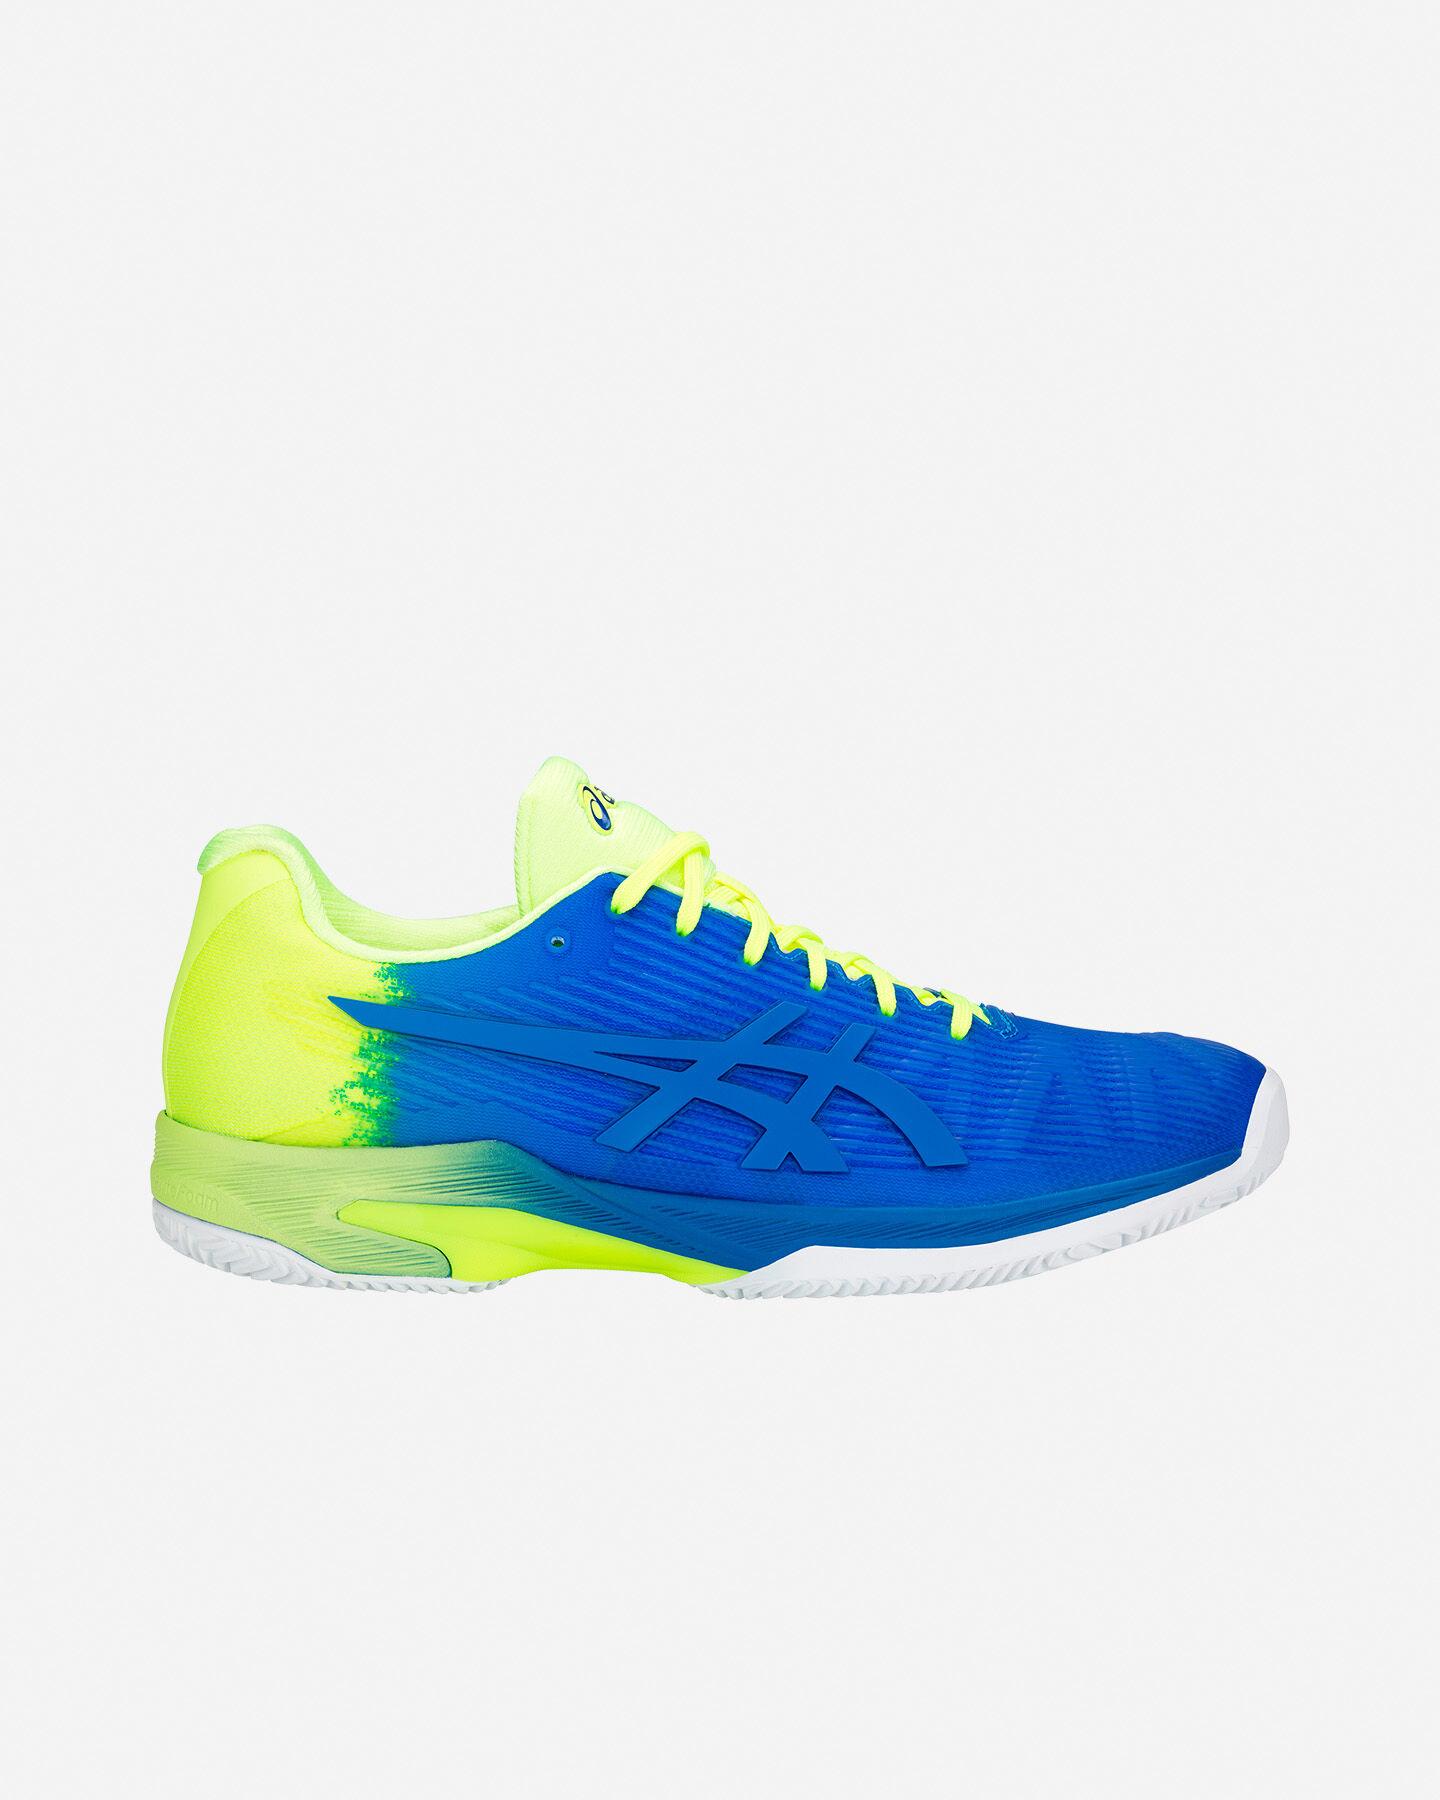 Sport uomo Cisalfa scarpe per online da tennis Acquista 0wS7qX